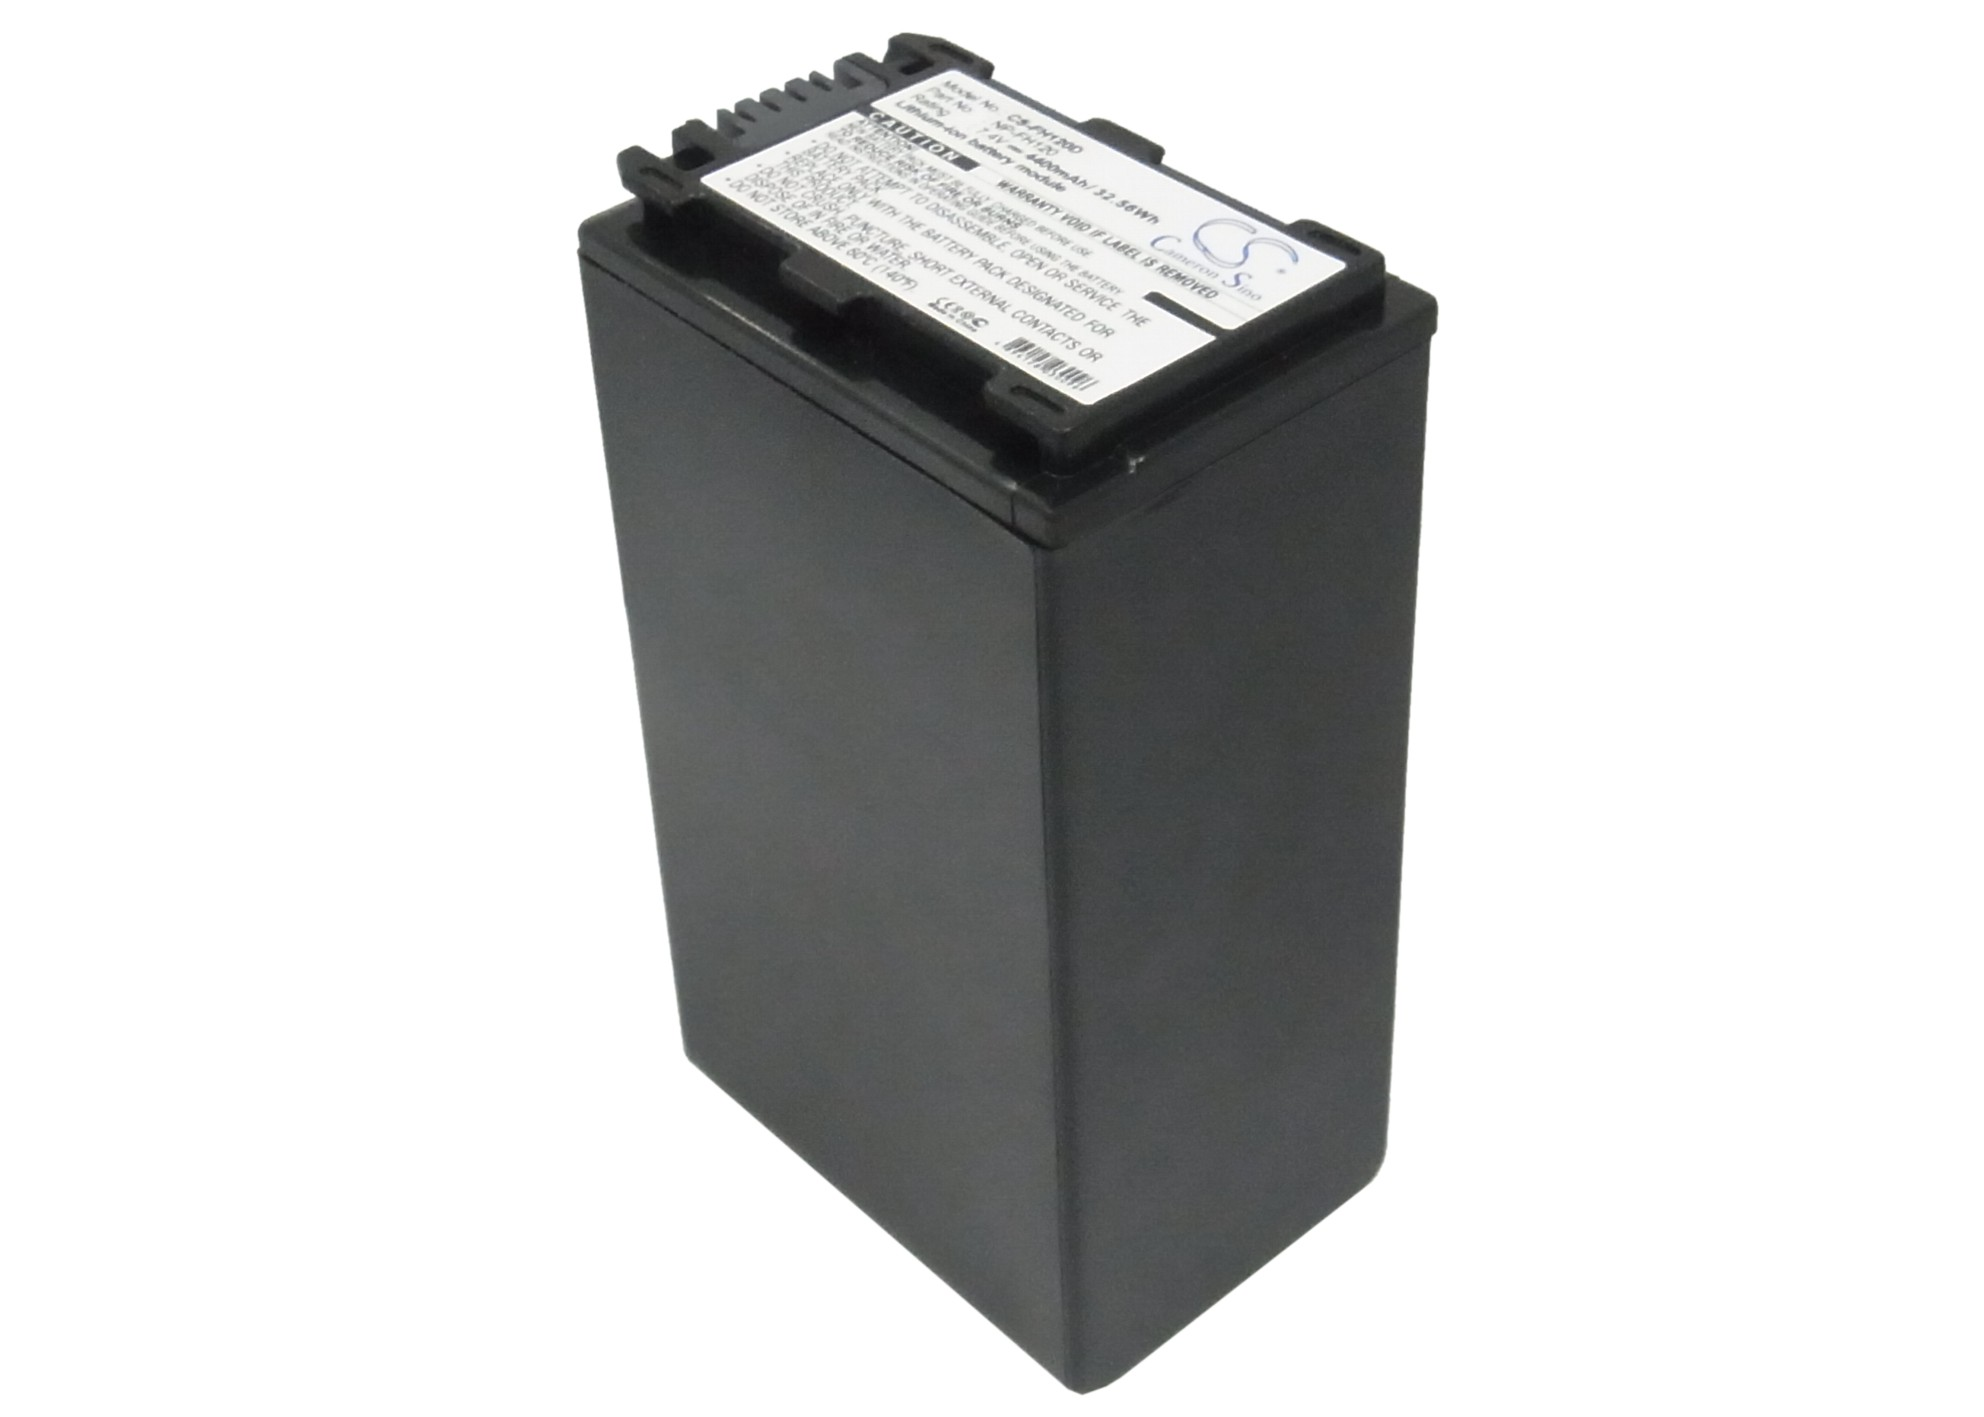 Cameron Sino baterie do kamer a fotoaparátů pro SONY DCR-DVD404E 7.4V Li-ion 4400mAh černá - neoriginální